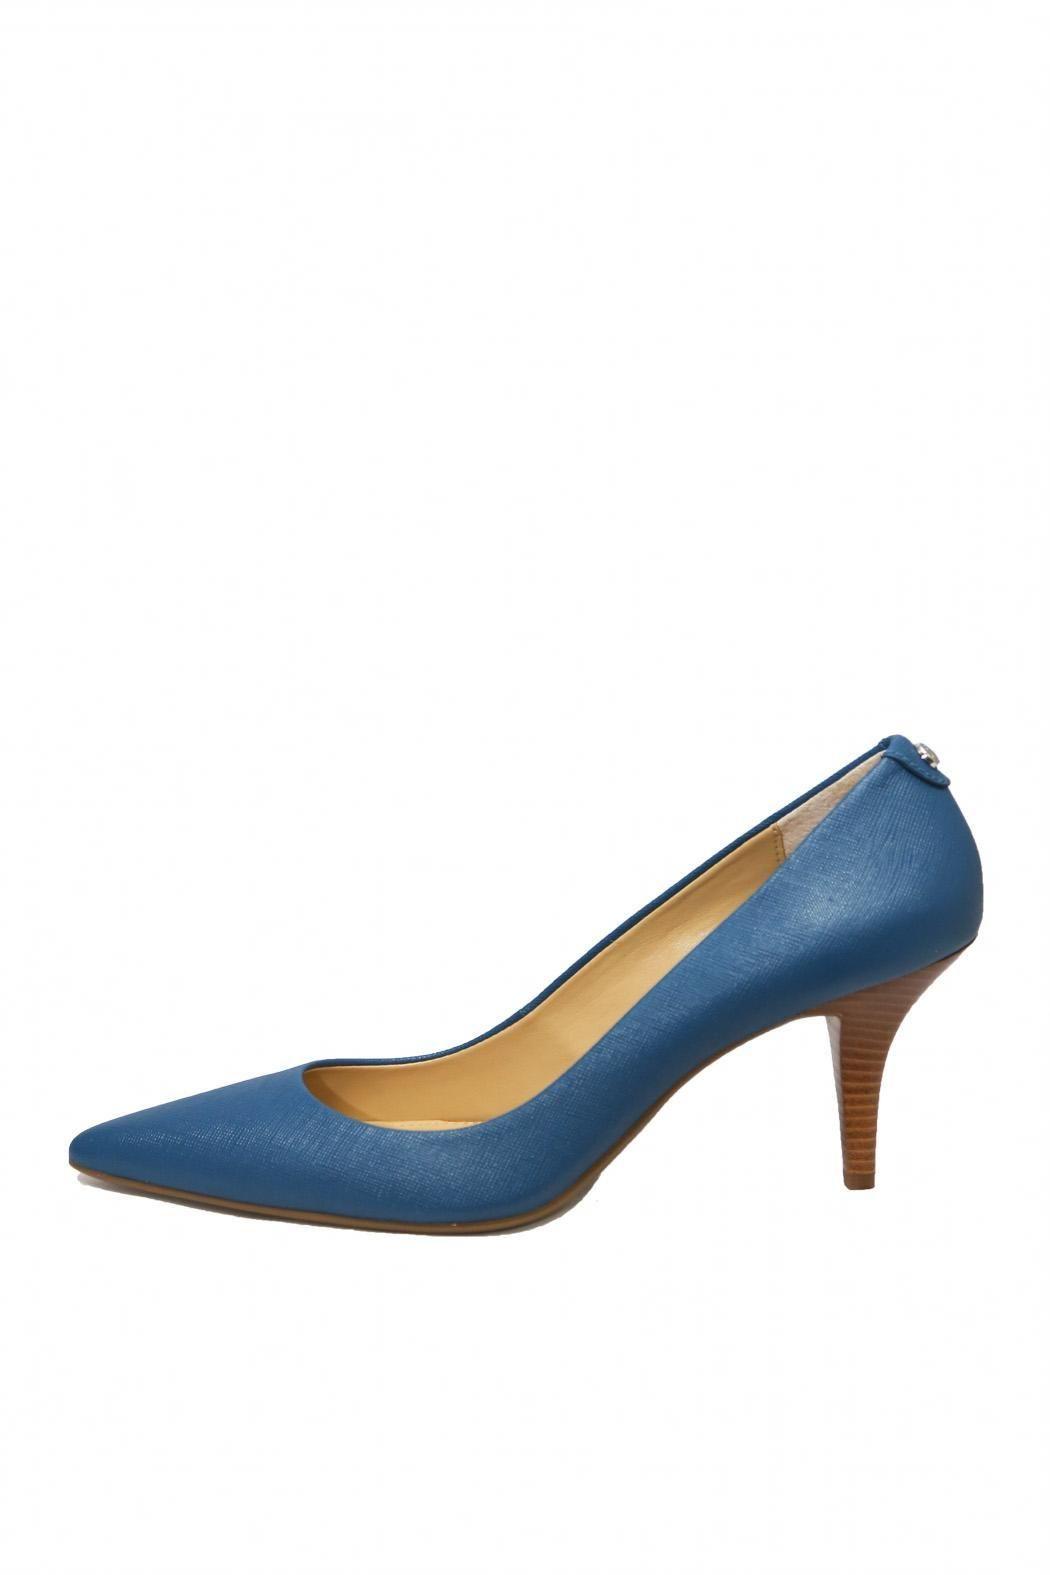 Dressy Mid Pump | Heels, Shoes heels